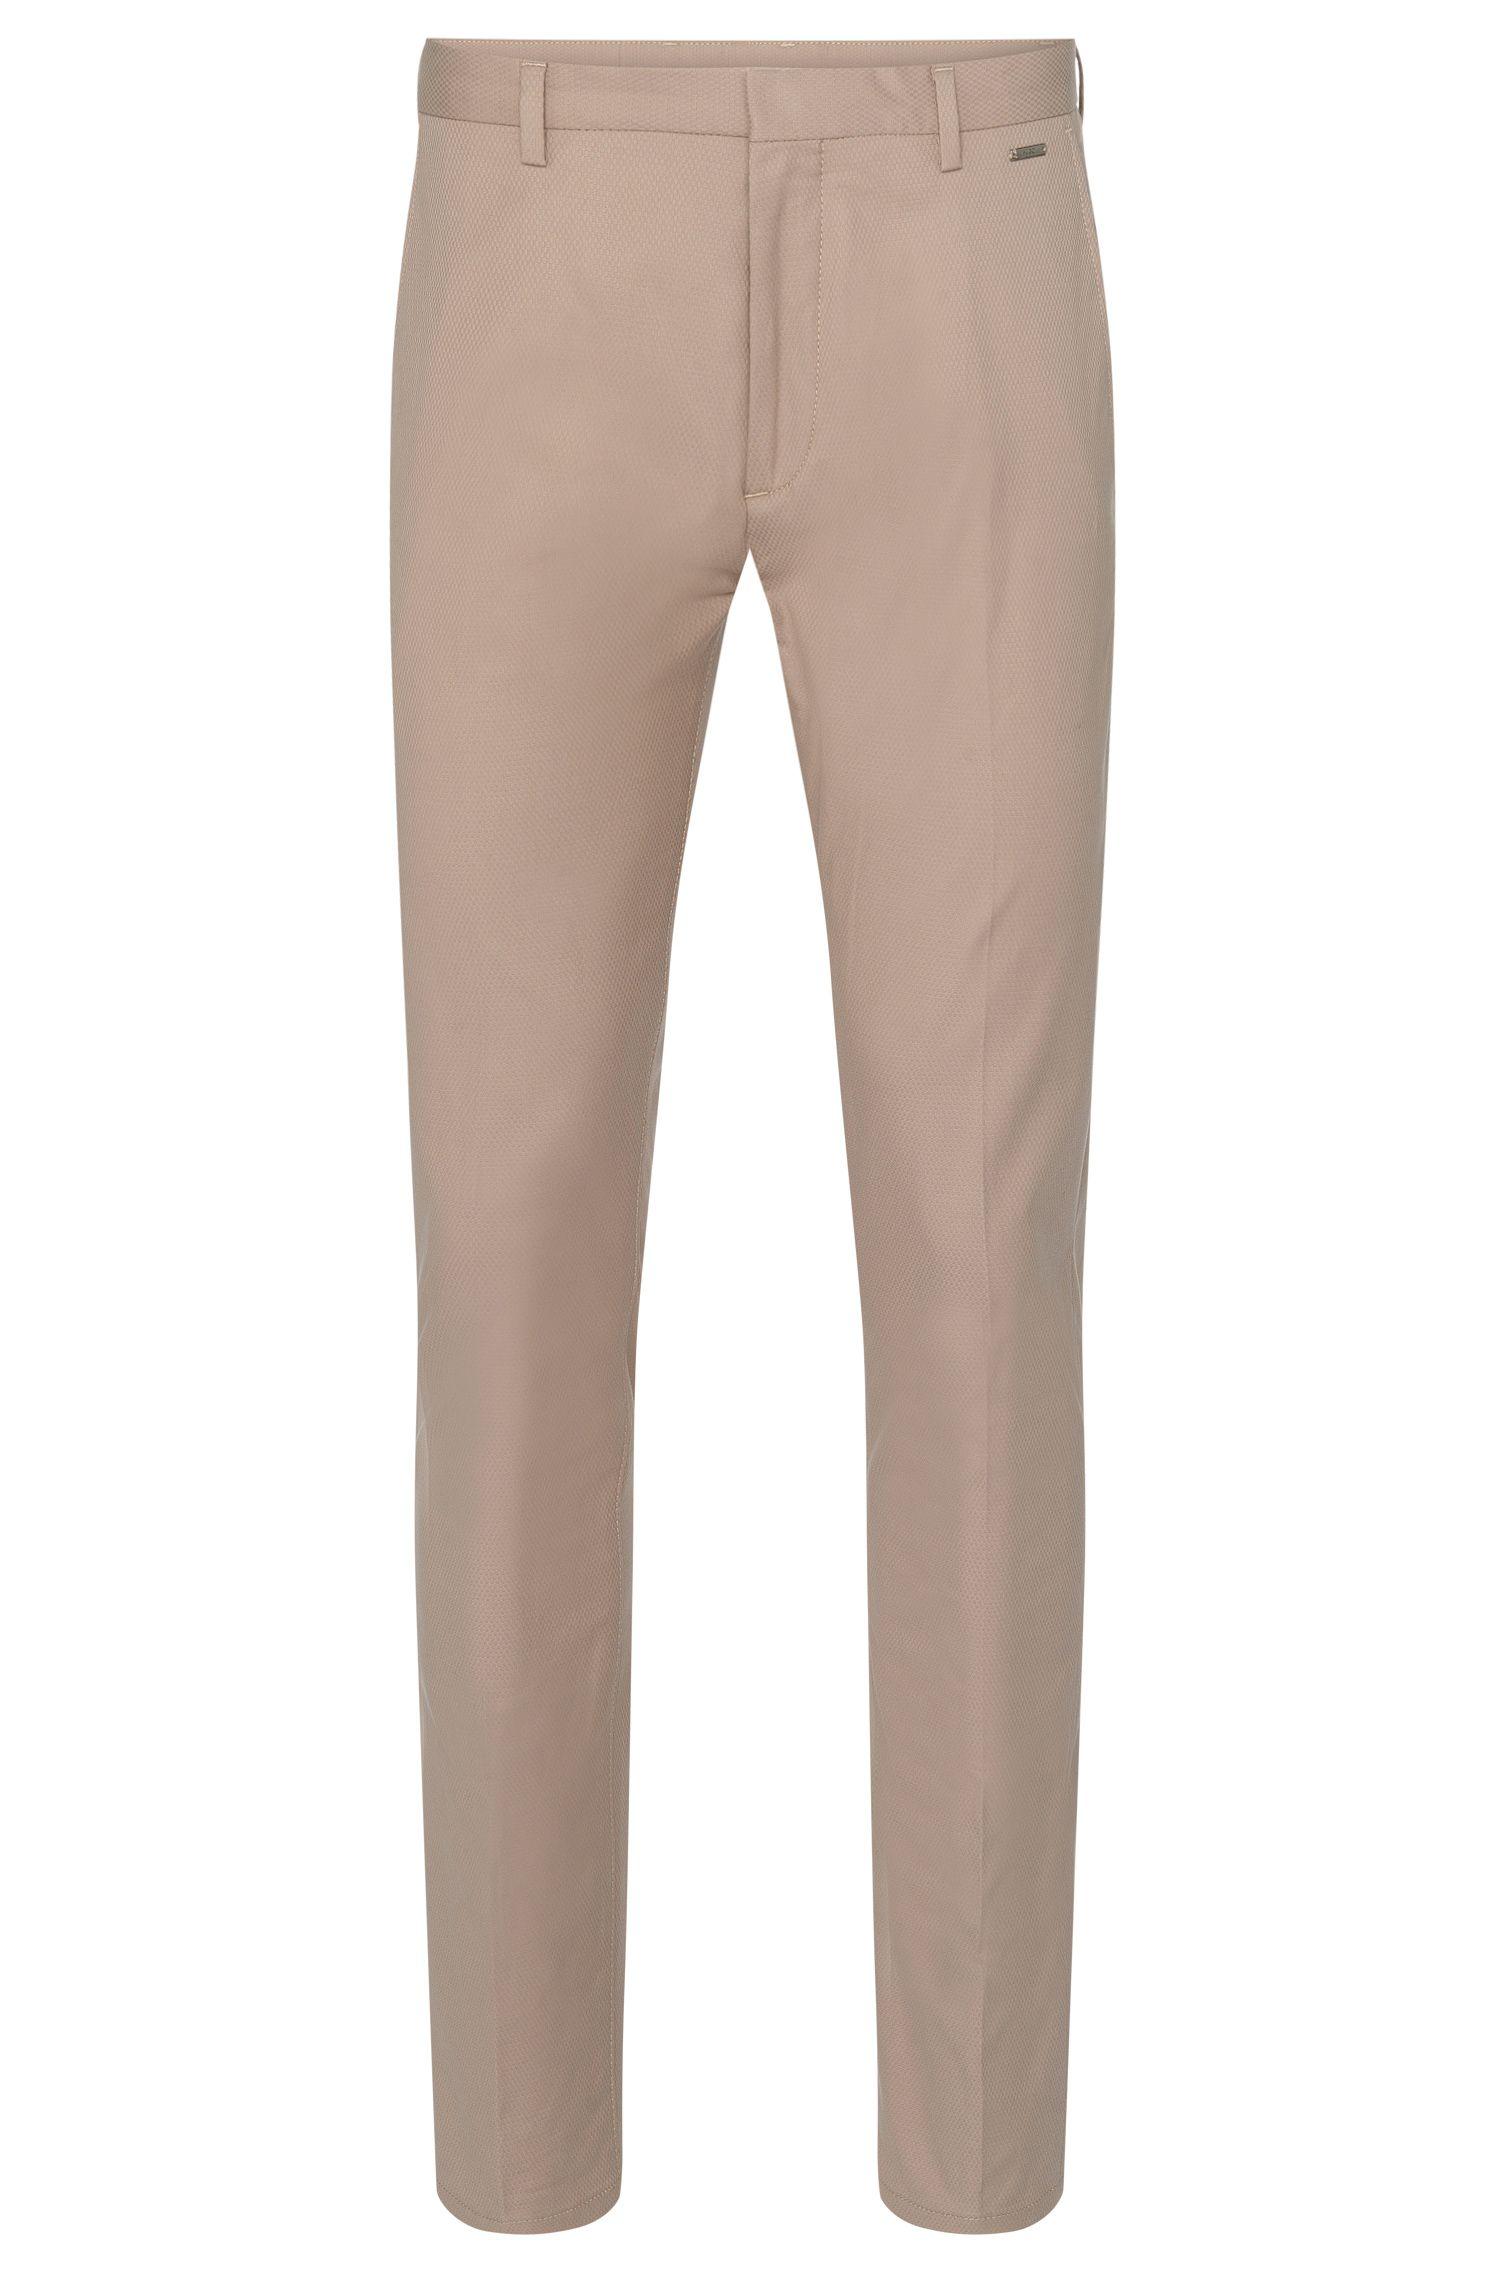 Pantalón regular fit en mezcla de algodón elástico con textura: 'Helgo1'